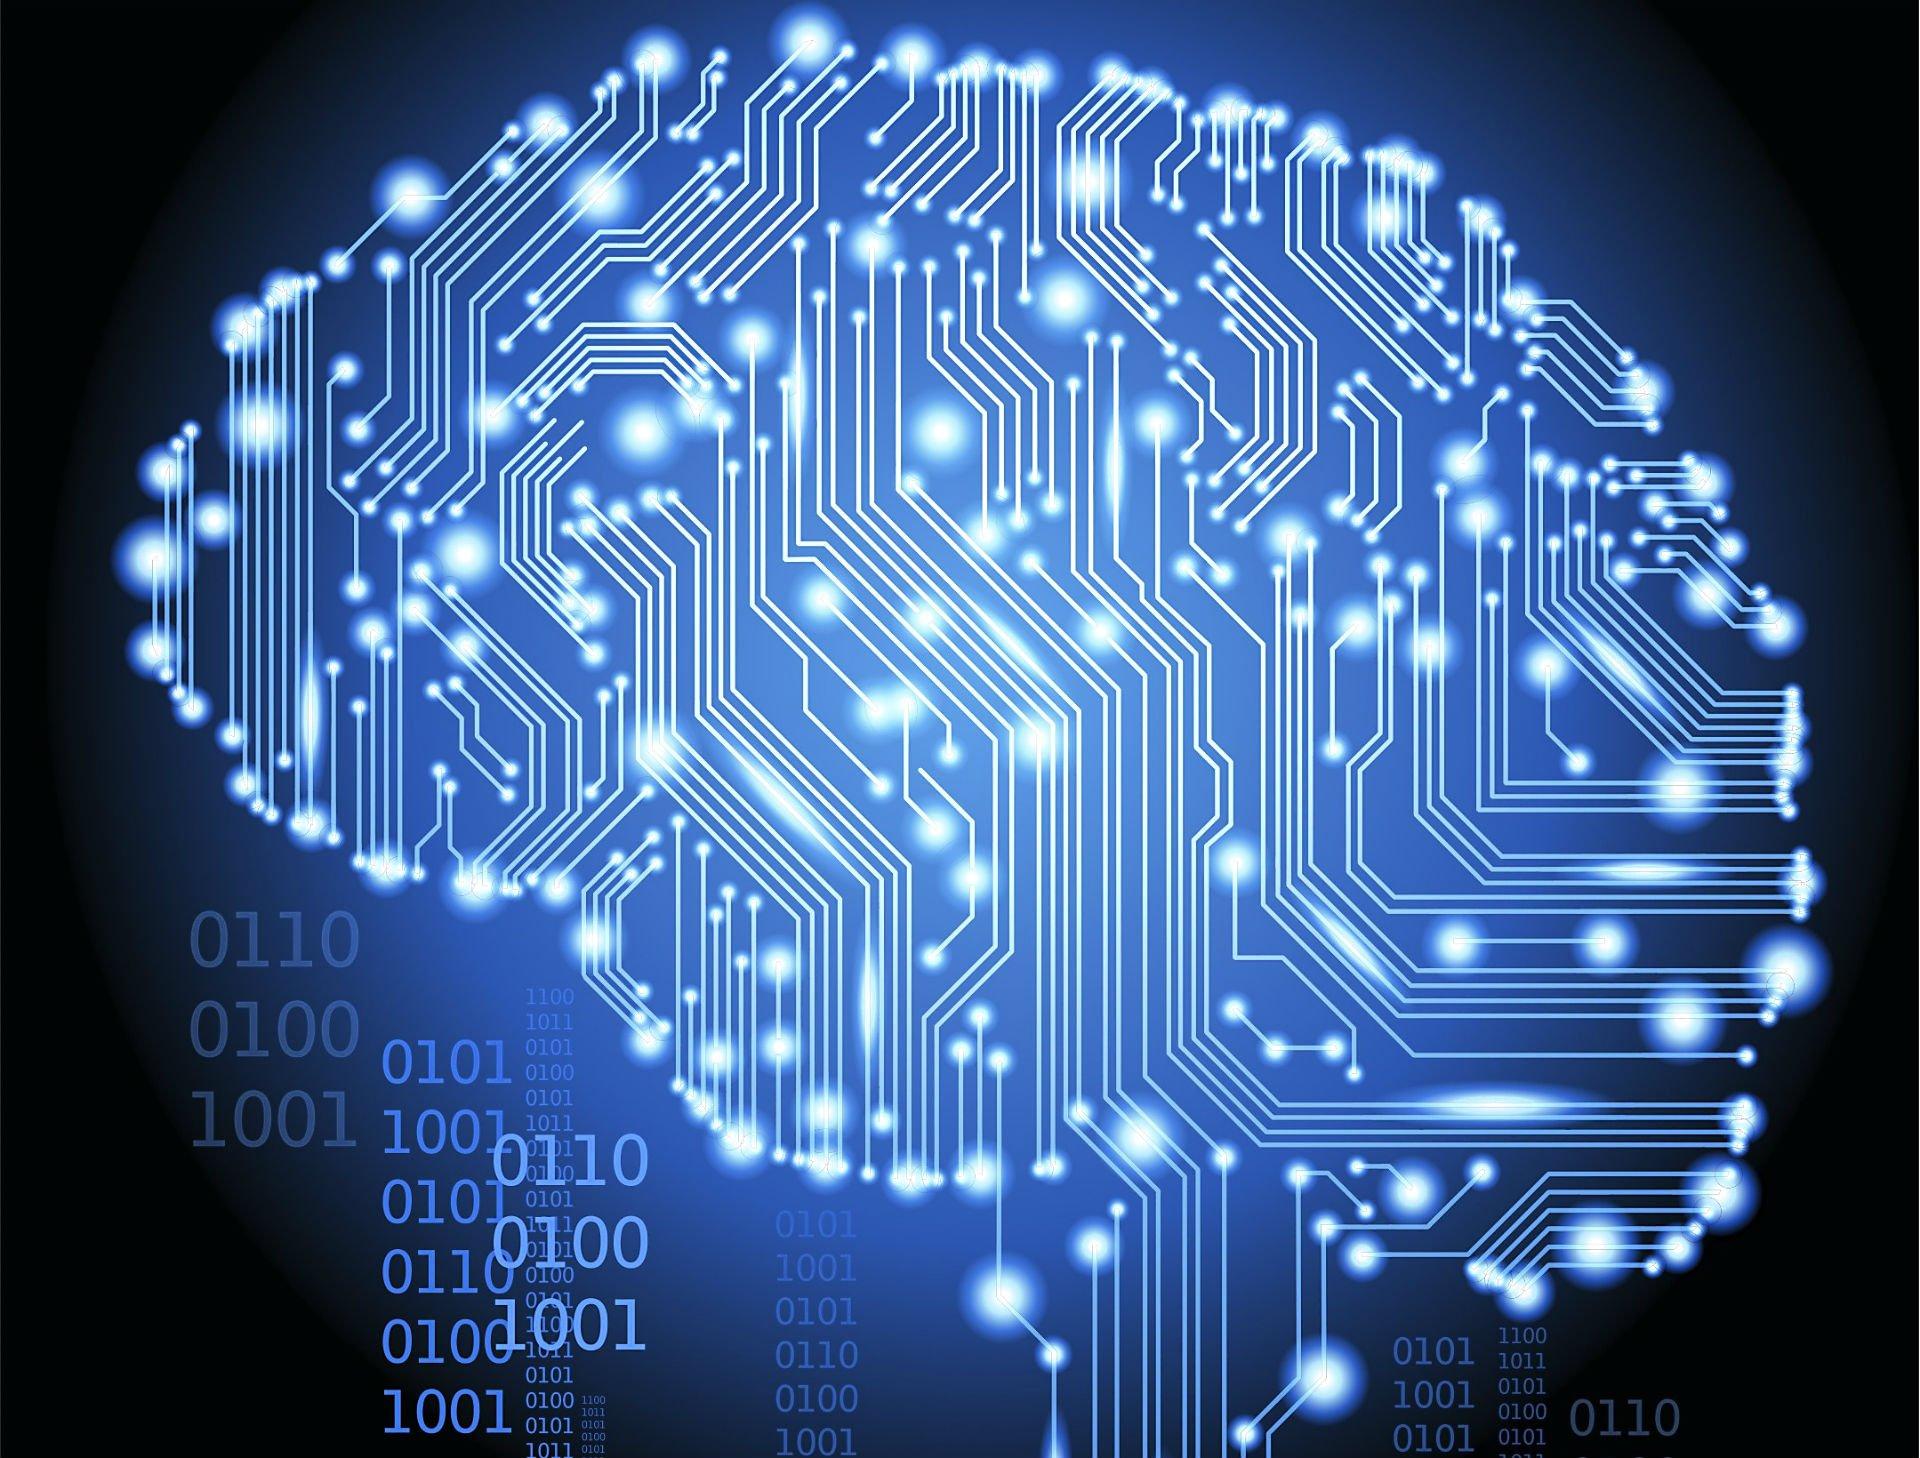 computer engineering science tech brain wallpaper background 1920x1458